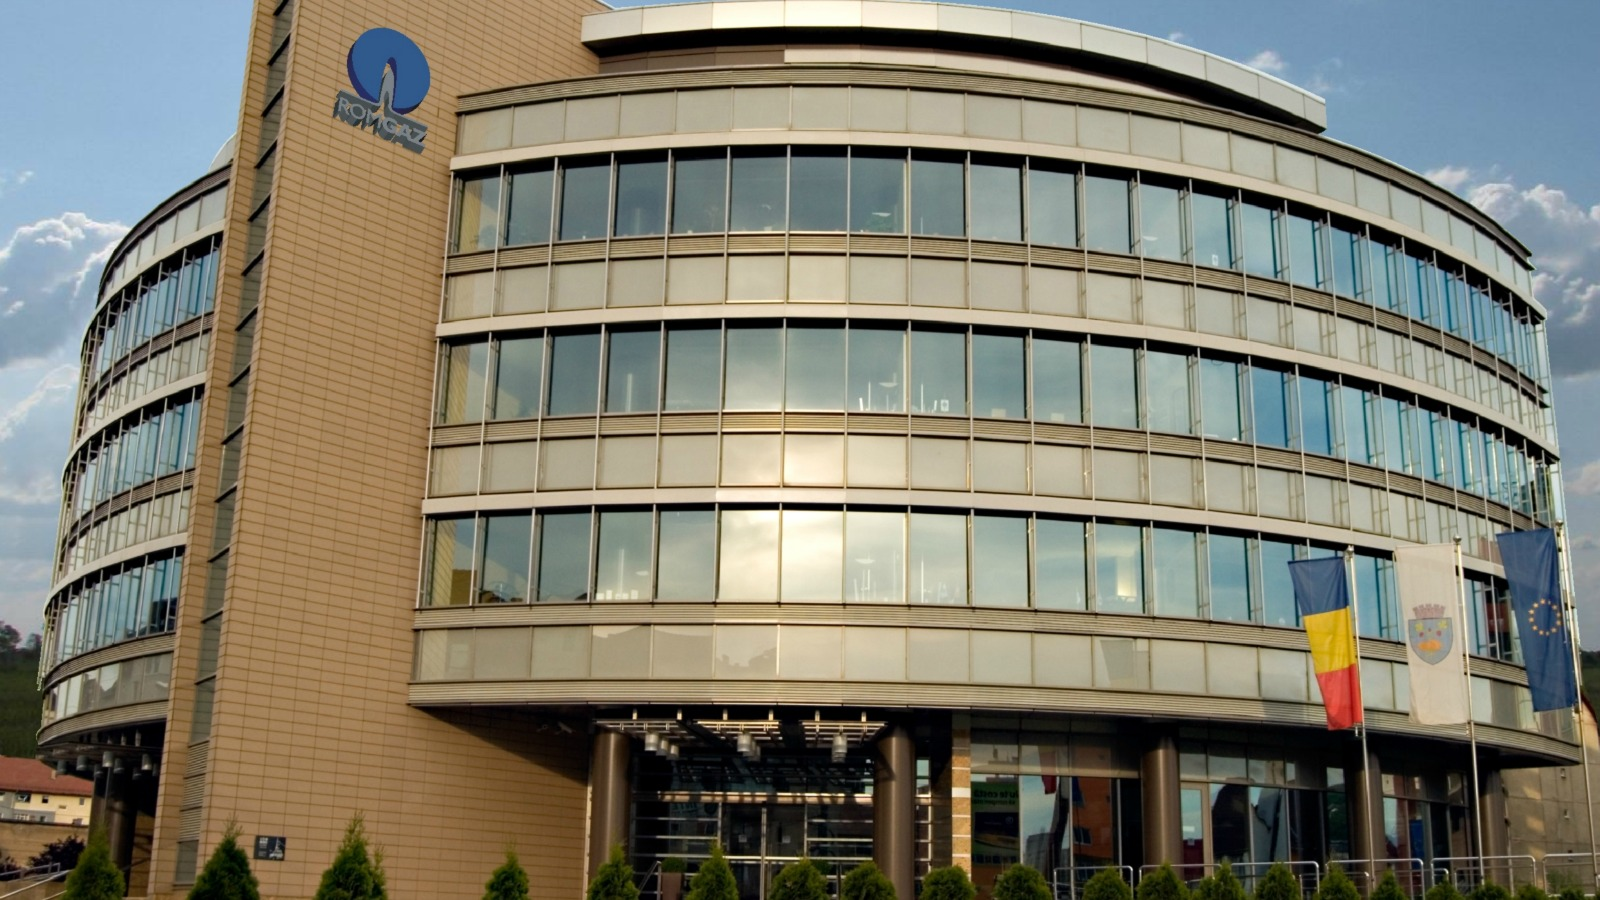 Romgaz Medias records higher revenues but lower net profit